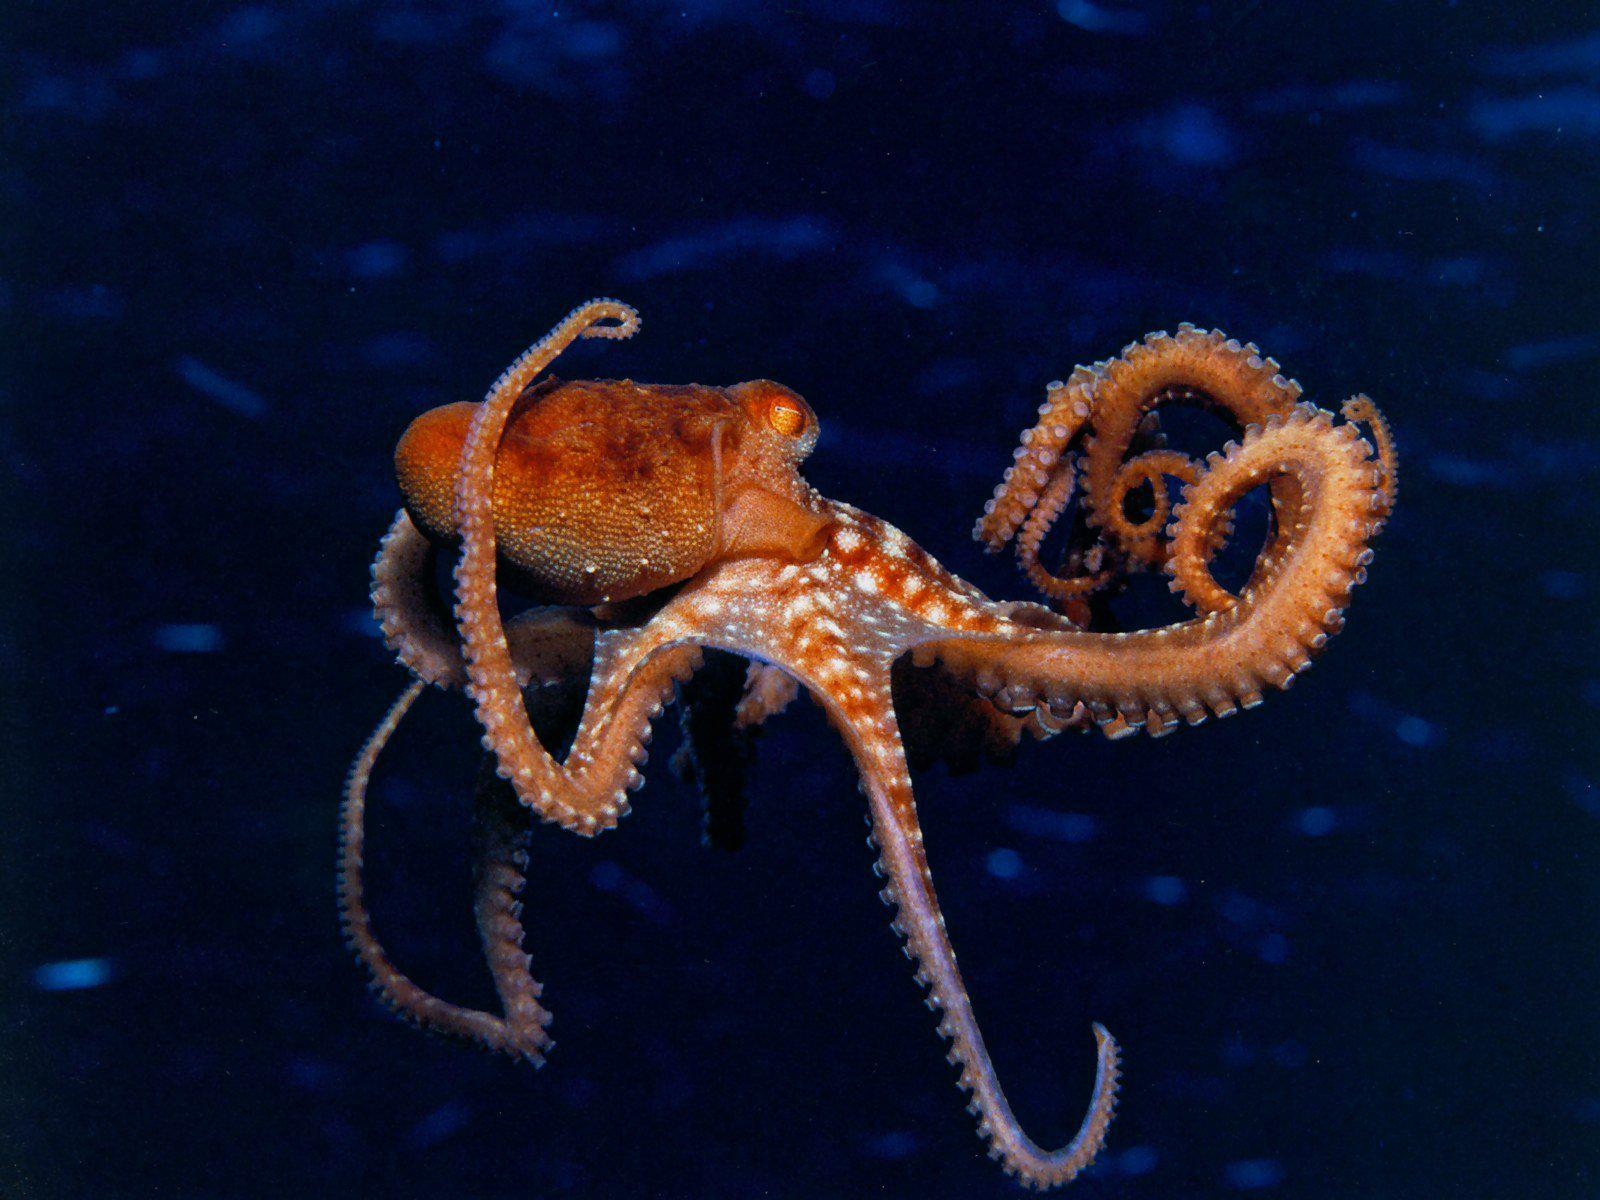 Tropical Ocean 3d Live Wallpaper Hd Octopus Sealife Underwater Ocean Sea Images Wallpaper